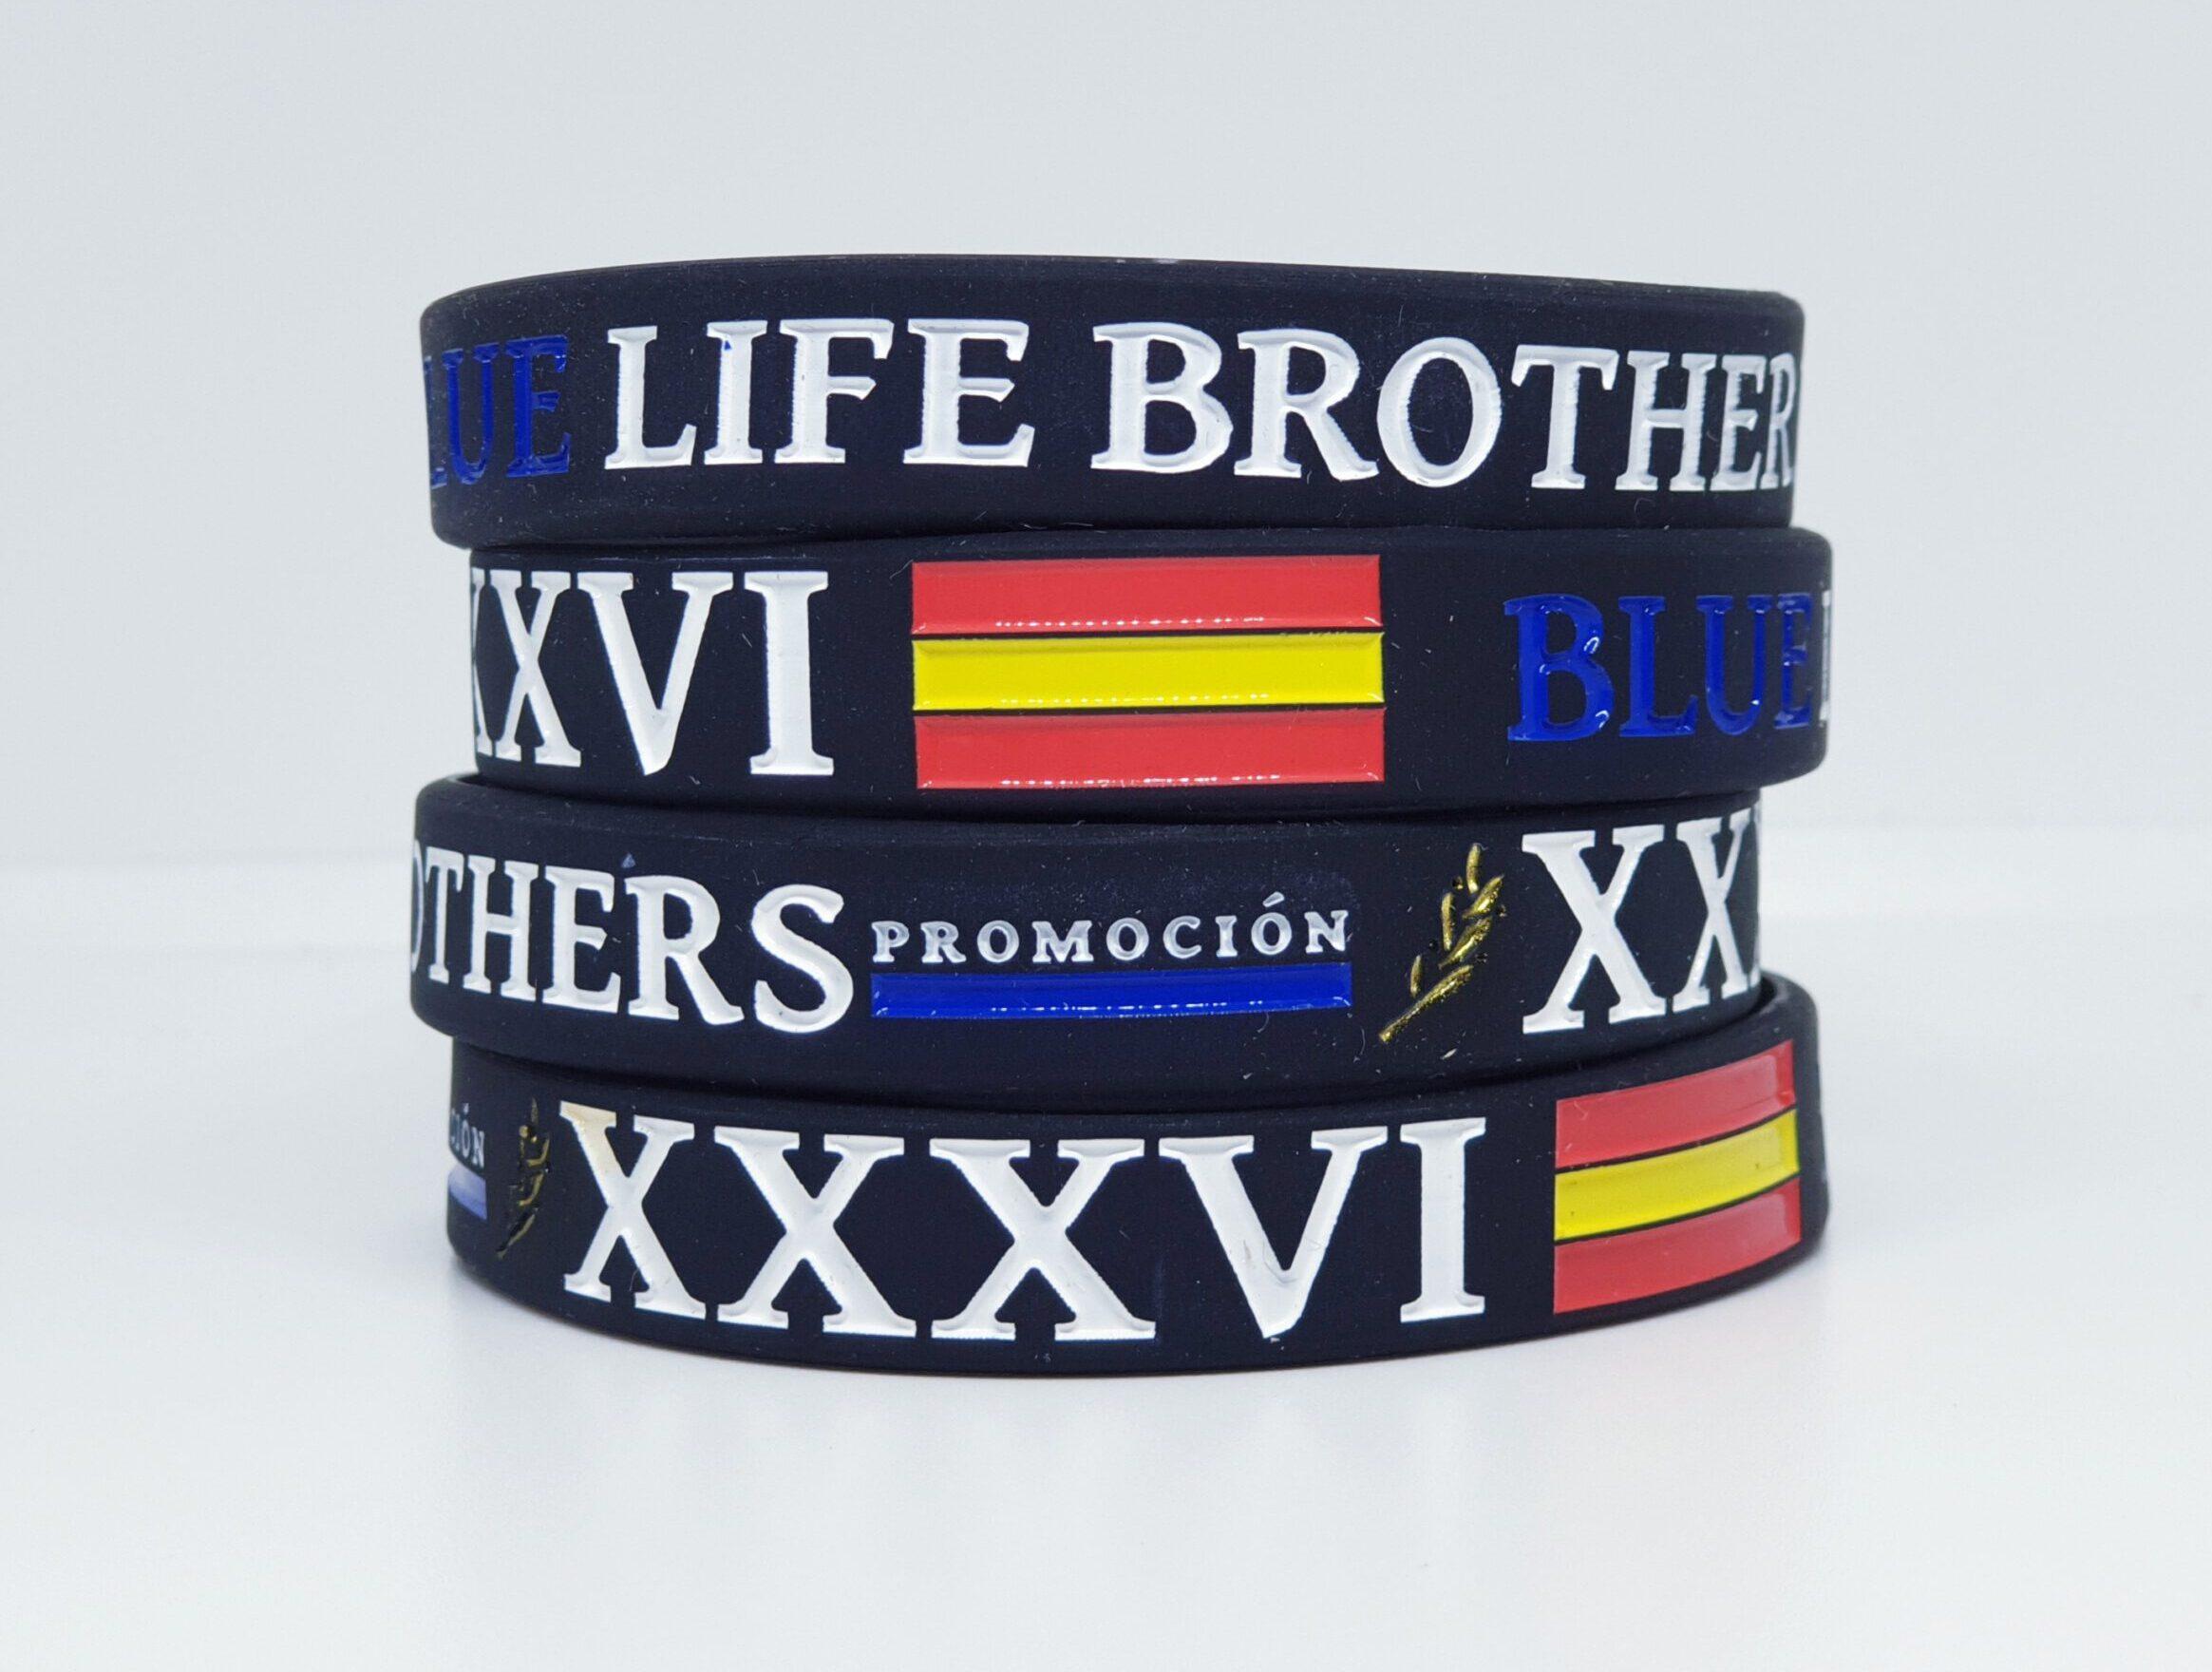 Pulsera blue life brothers promoción XXXVI